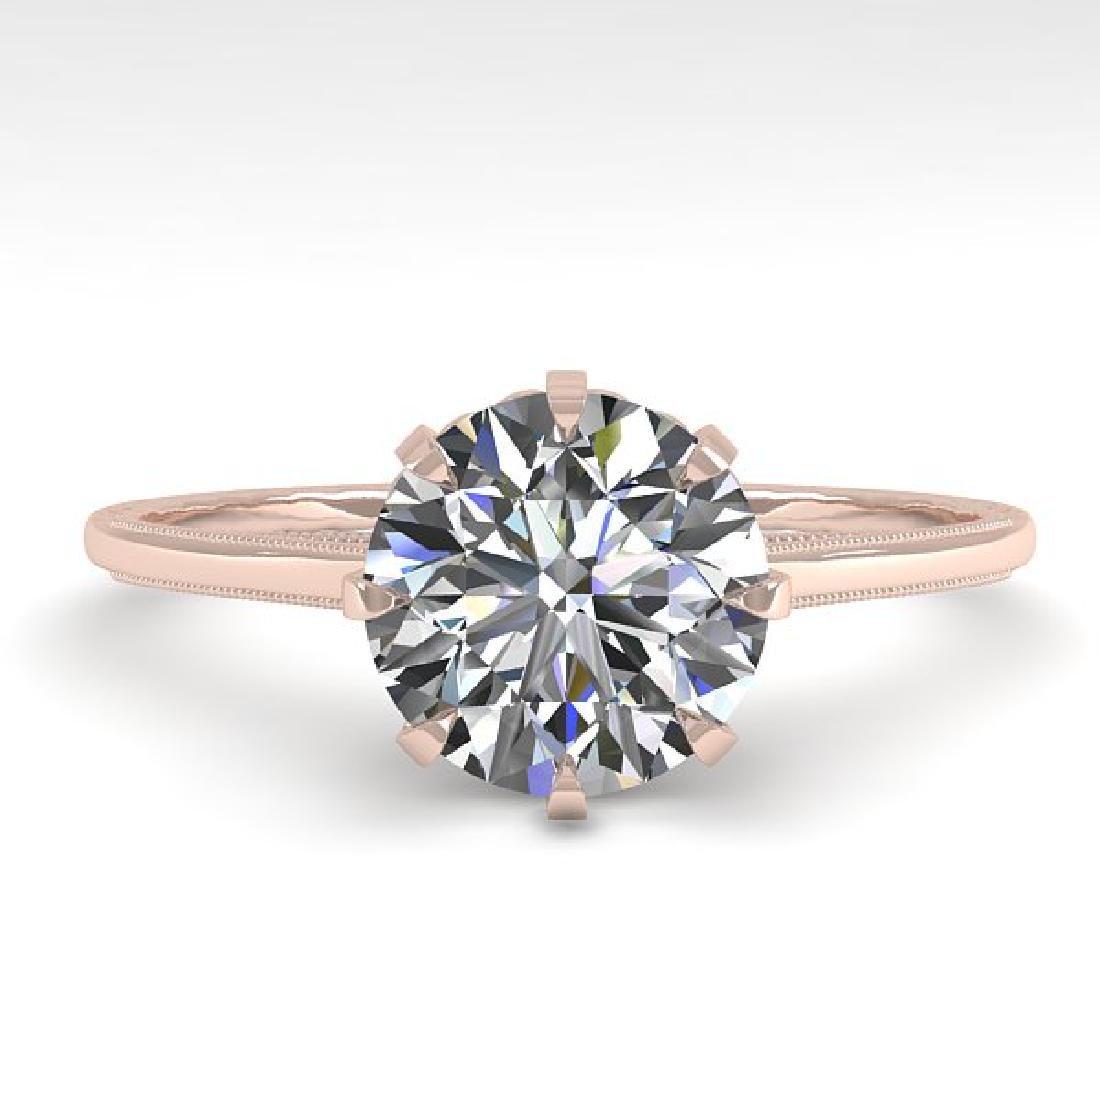 1.51 CTW Certified VS/SI Diamond Ring 14K Rose Gold